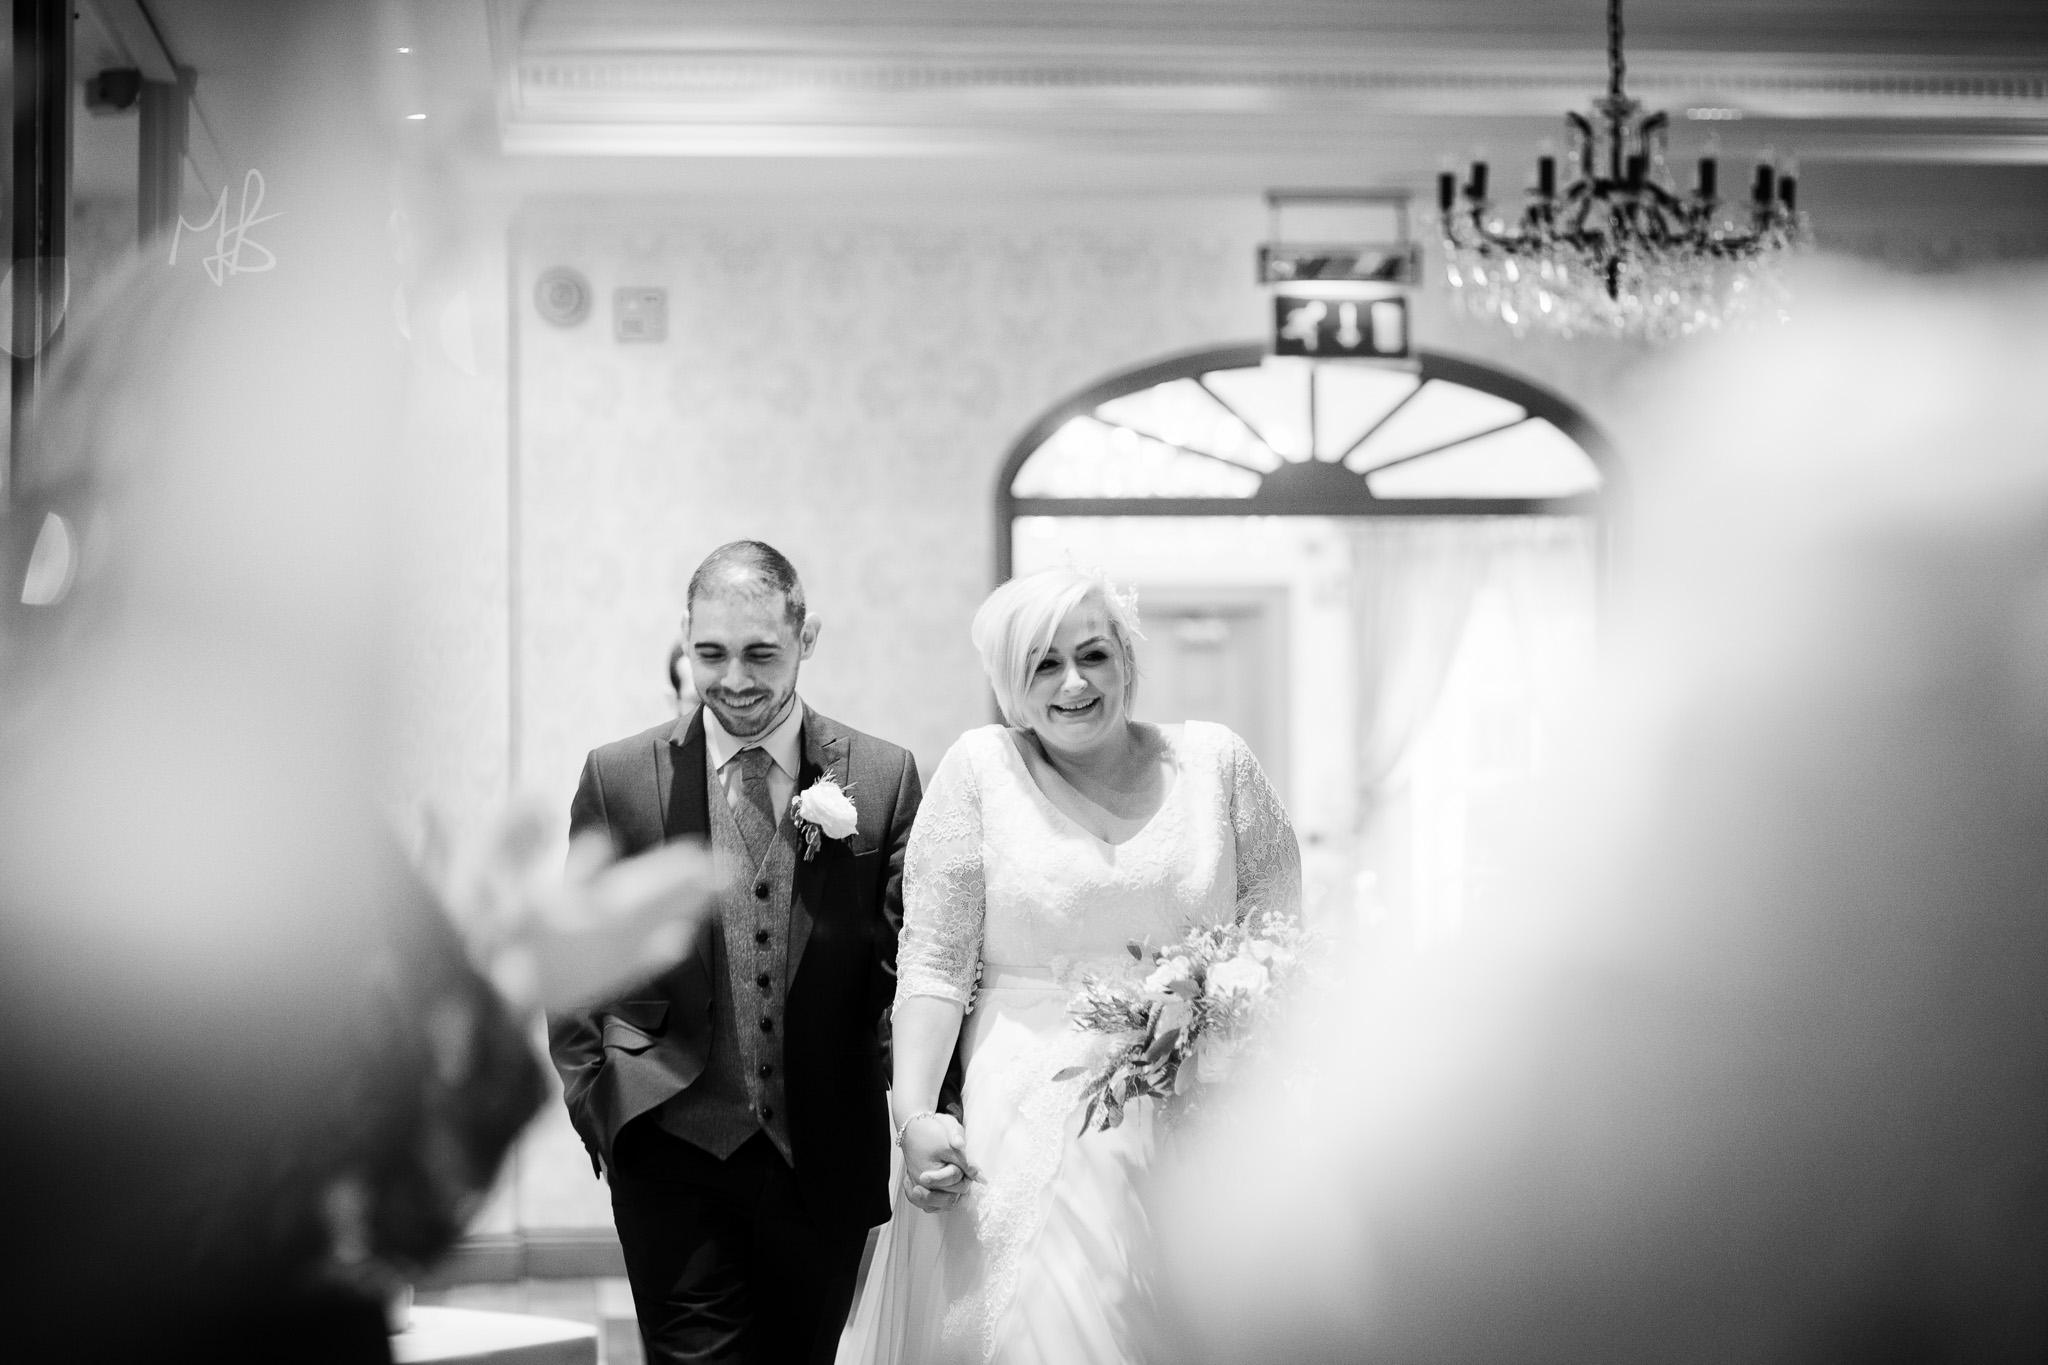 Northern-Ireland-Wedding-Photographer-Mark-Barnes-Ballymena_wedding-photography-Leighinmohr-House-Seamas_Alanna_For-web-40.jpg